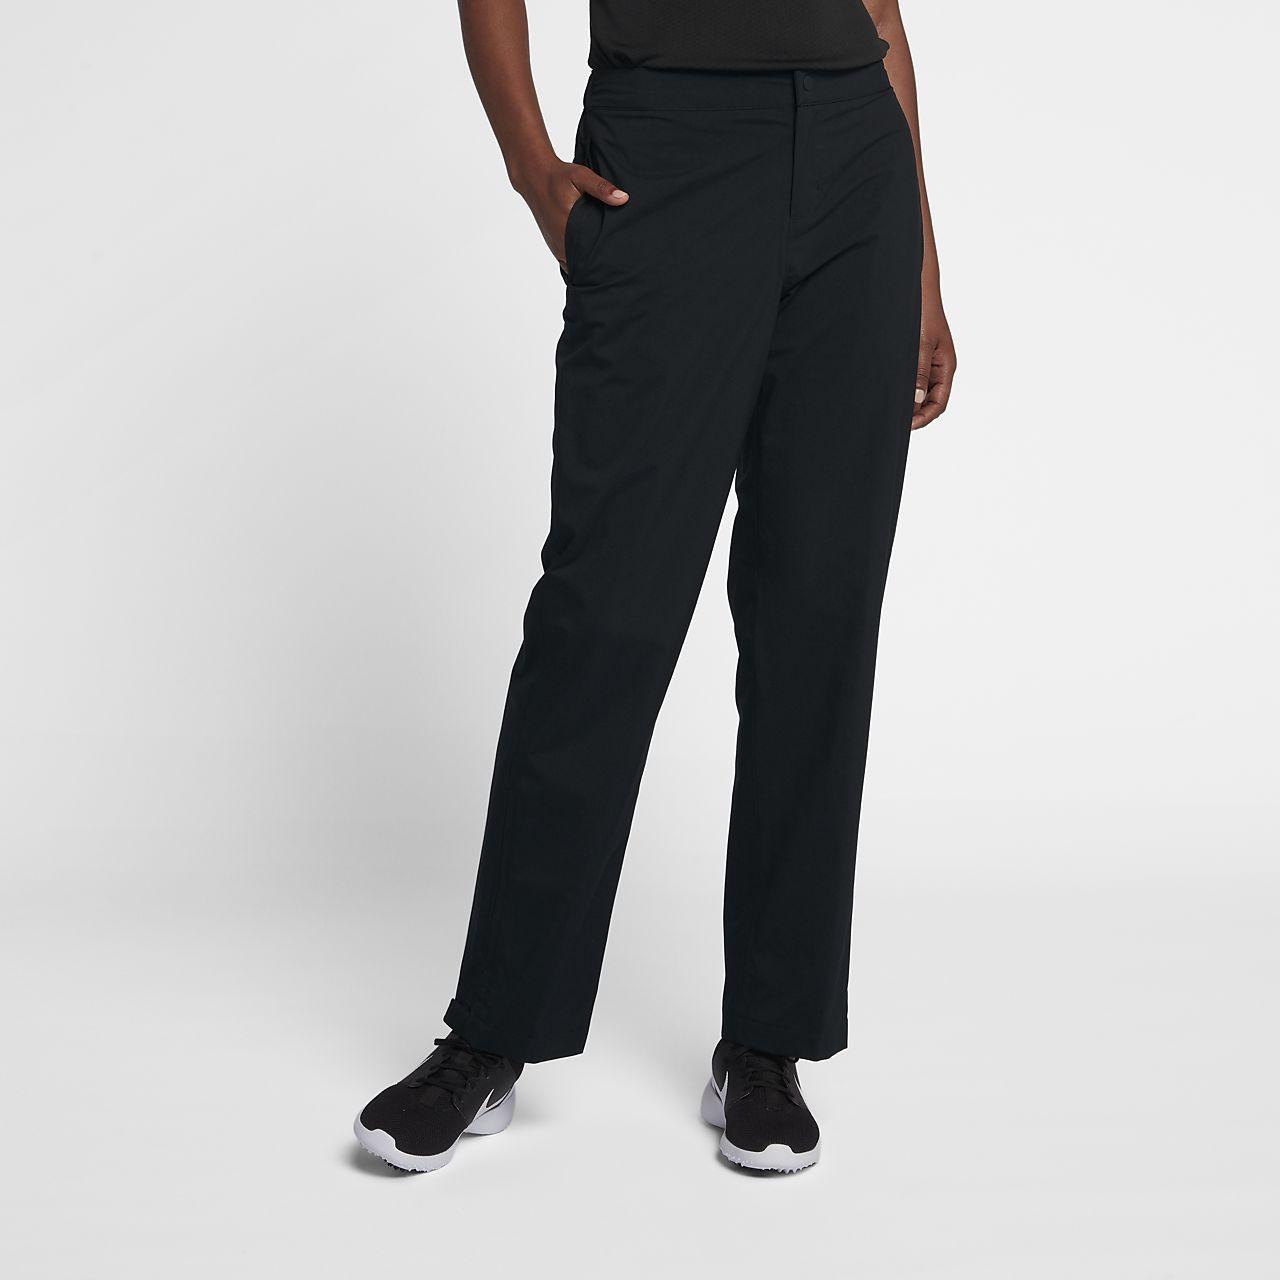 Pantalones de golf para mujer Nike HyperShield